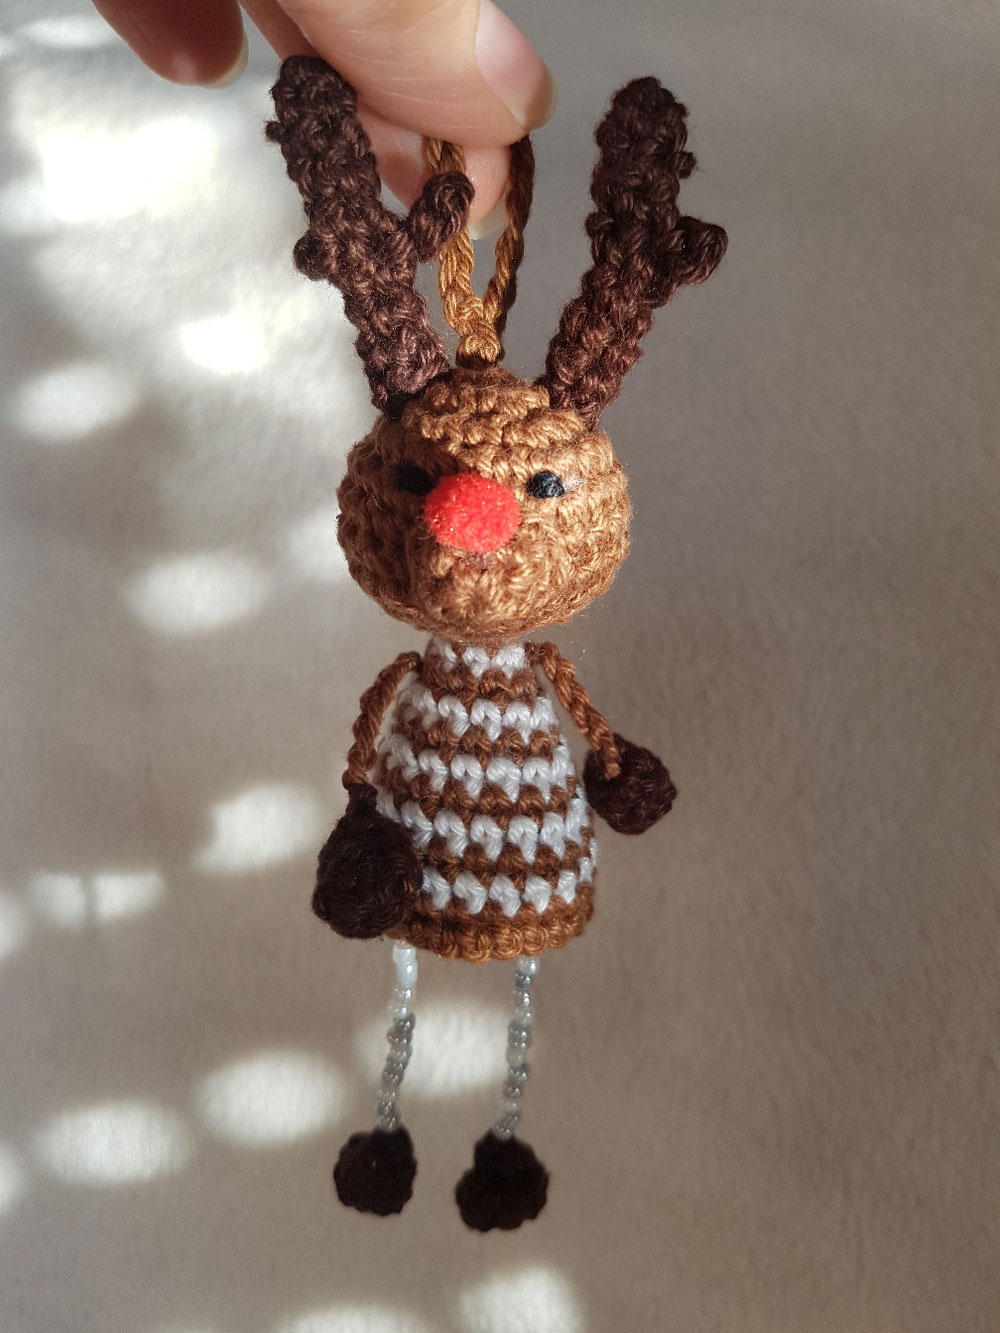 Christmasbaumler Rentier (Dat Yarn's Design)